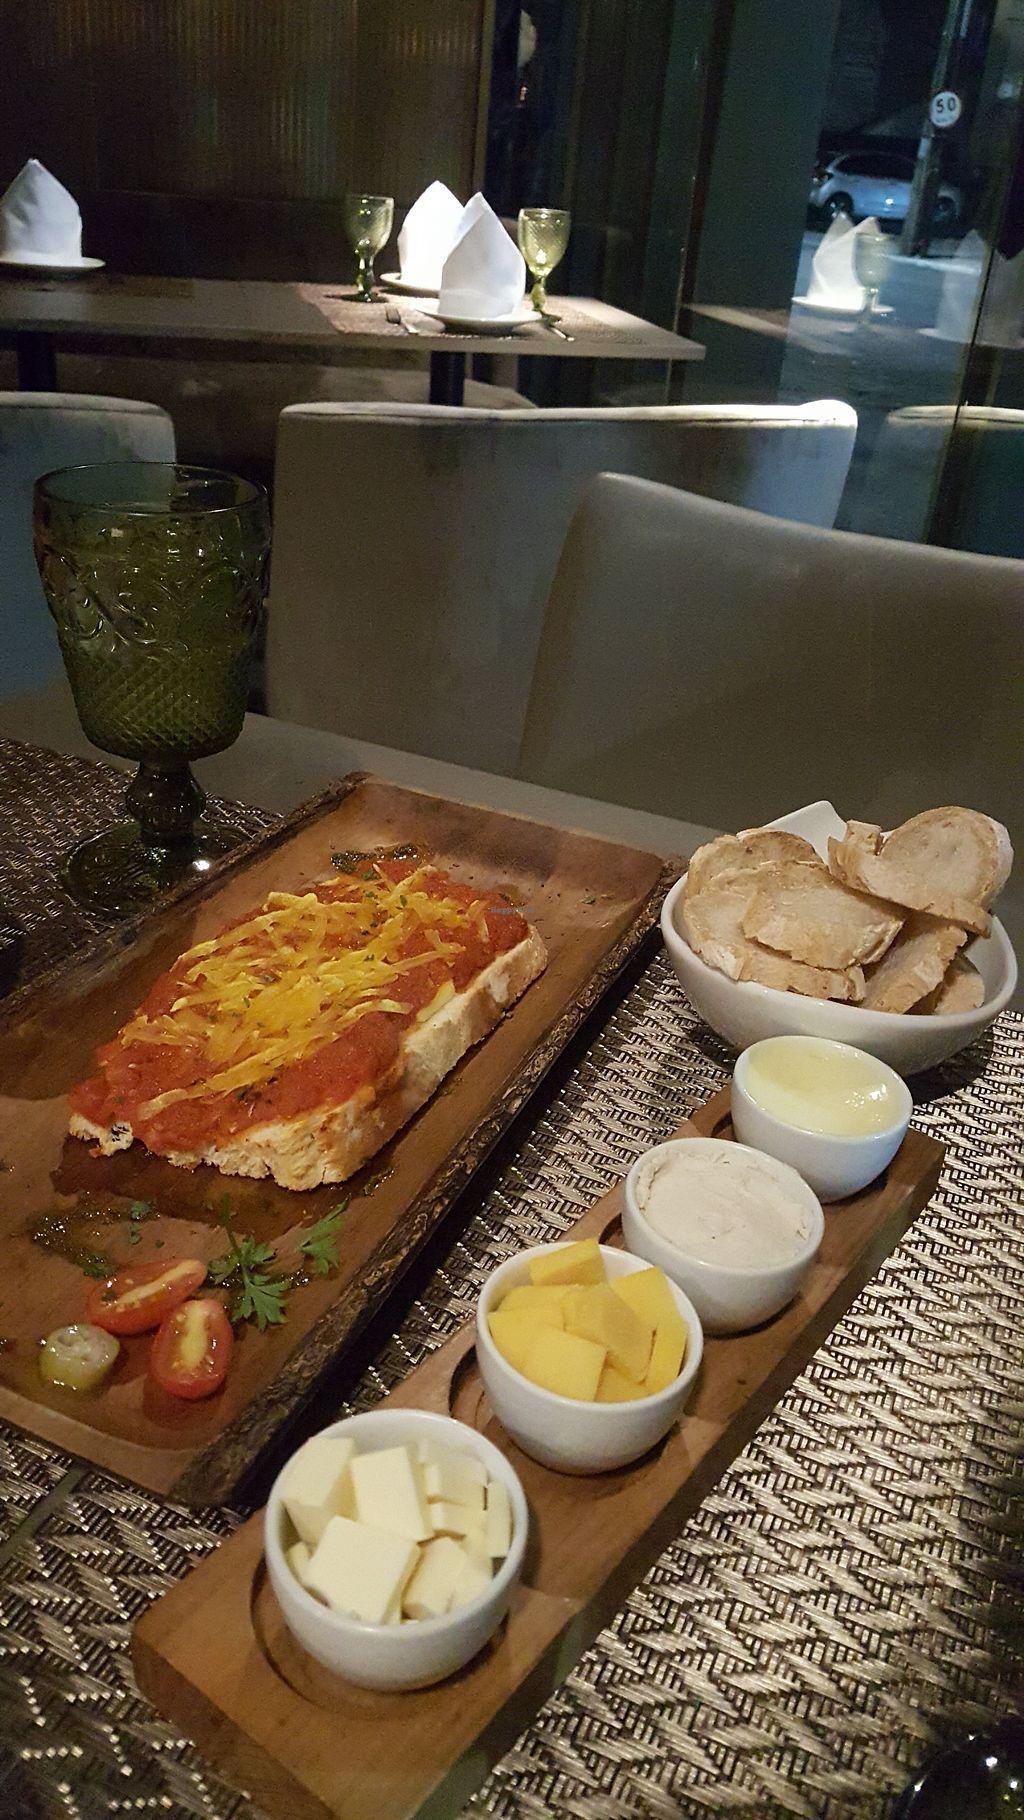 "Photo of Emporio Gourmet  by <a href=""/members/profile/sarahssoares"">sarahssoares</a> <br/>Bruscheta e entrada couvert <br/> March 8, 2018  - <a href='/contact/abuse/image/100382/368164'>Report</a>"